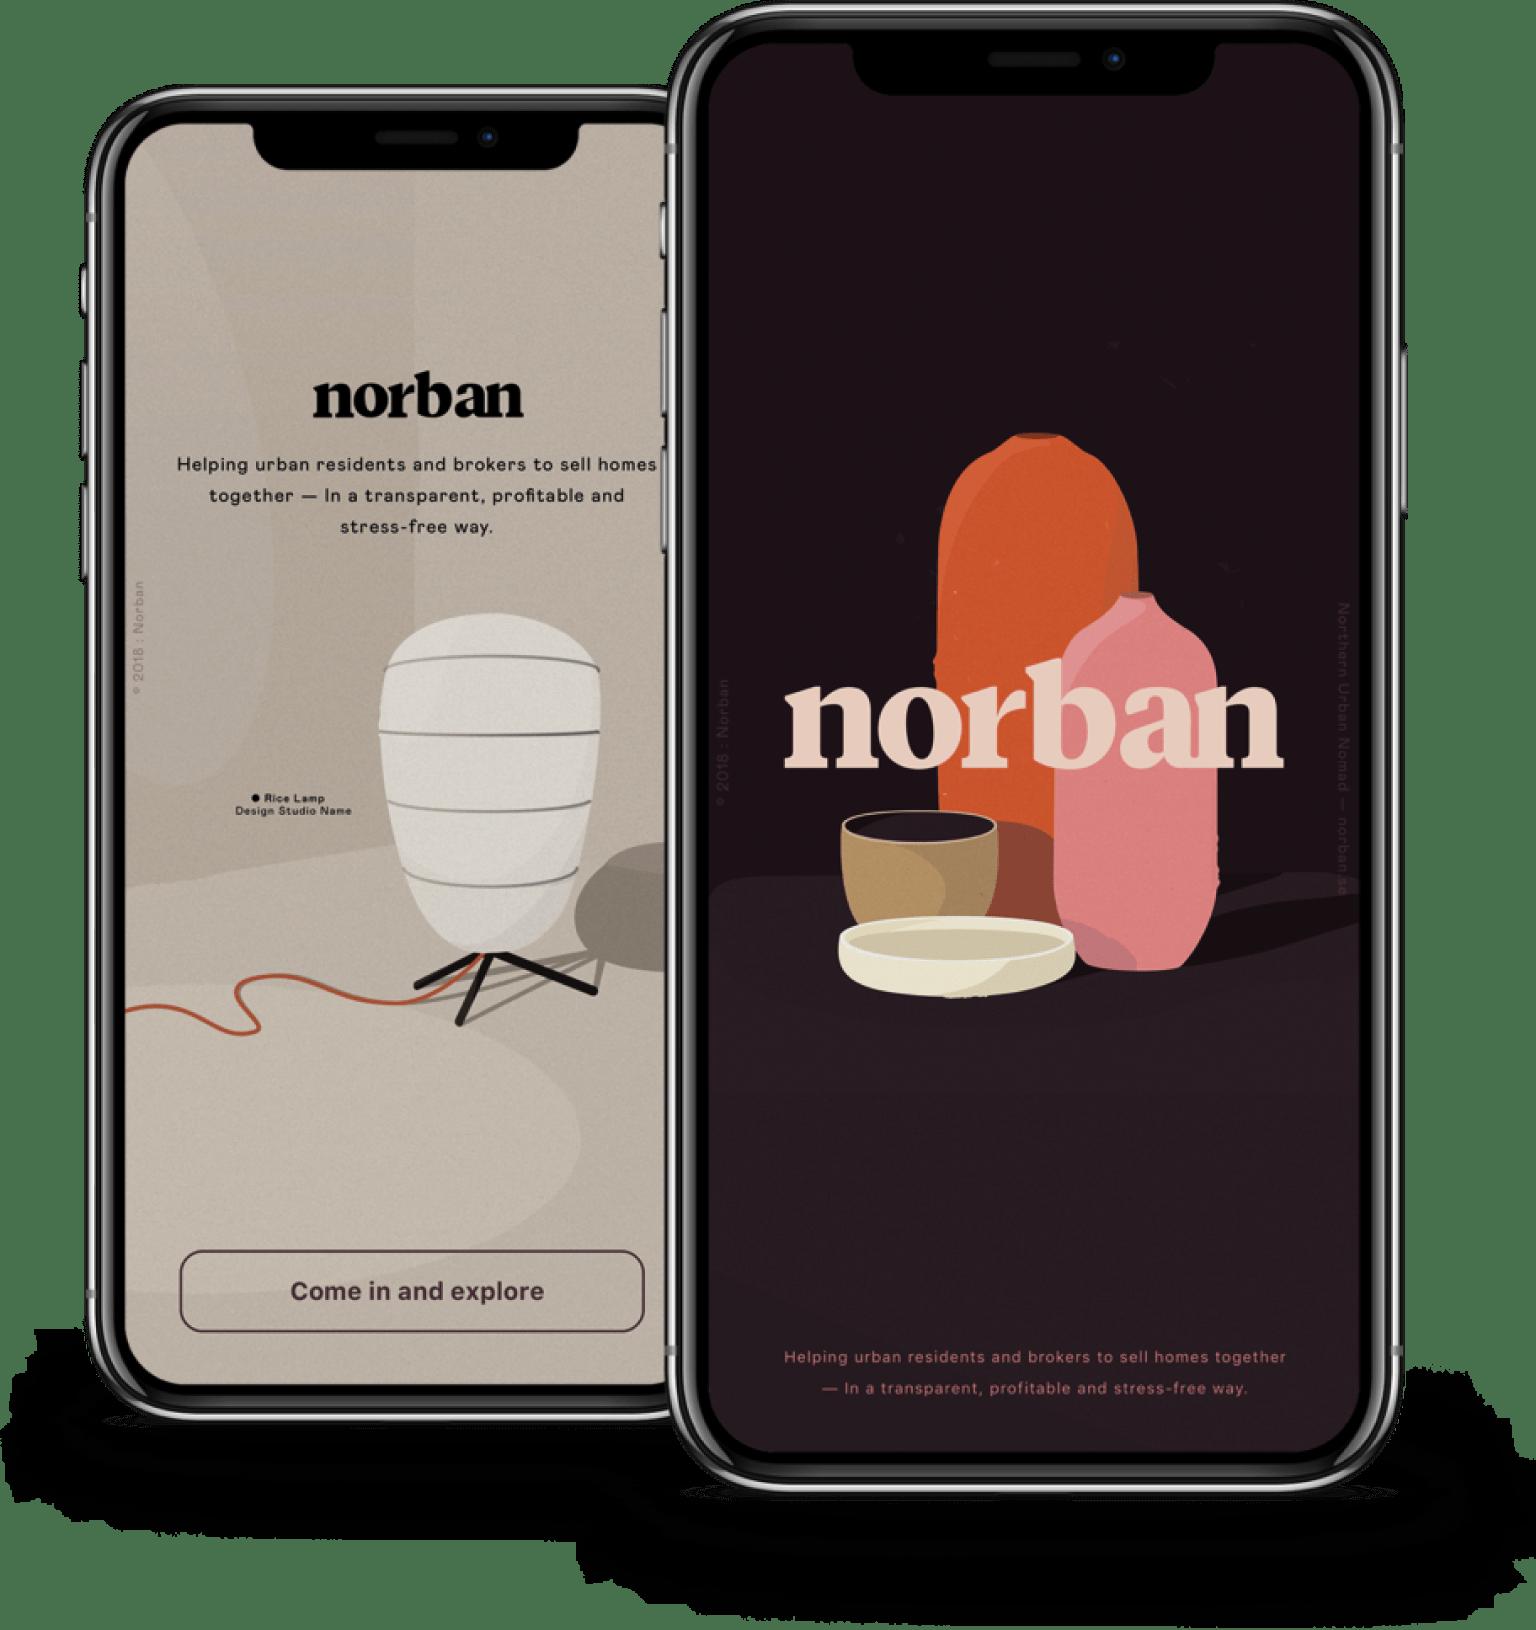 Norban-Brand-App-Splash-1